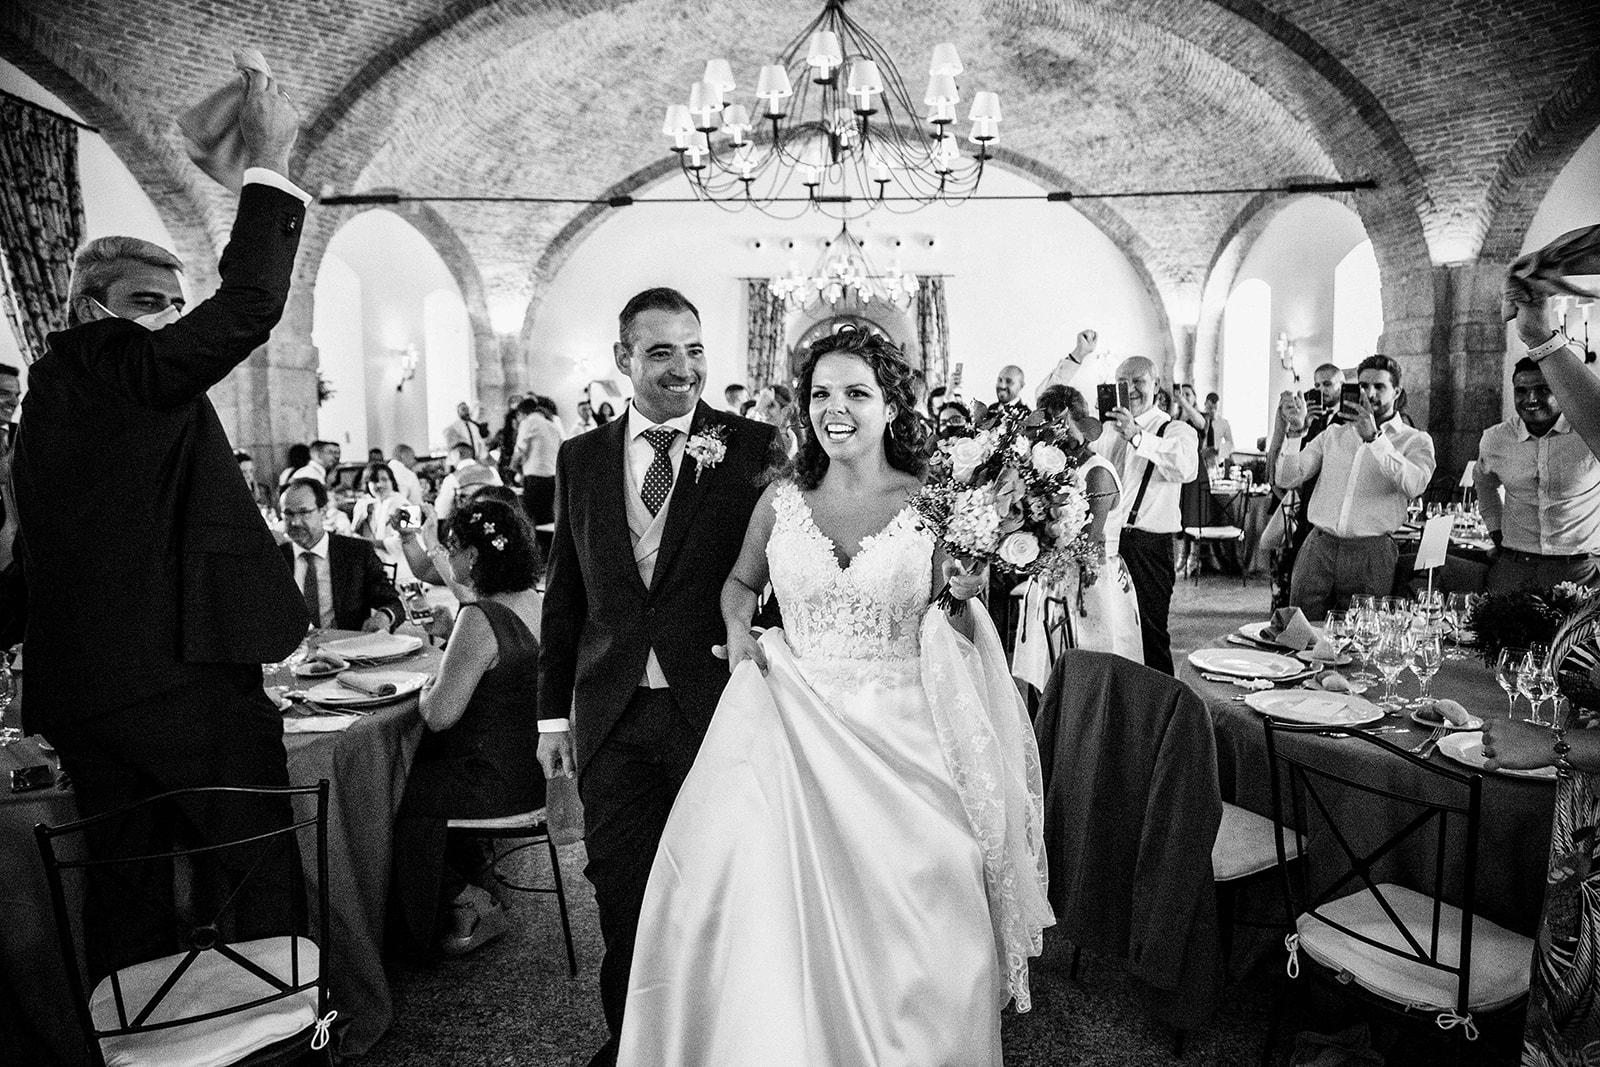 pareja en Boda en Pabellon de Caza Castillo de Viñuelas Madrid